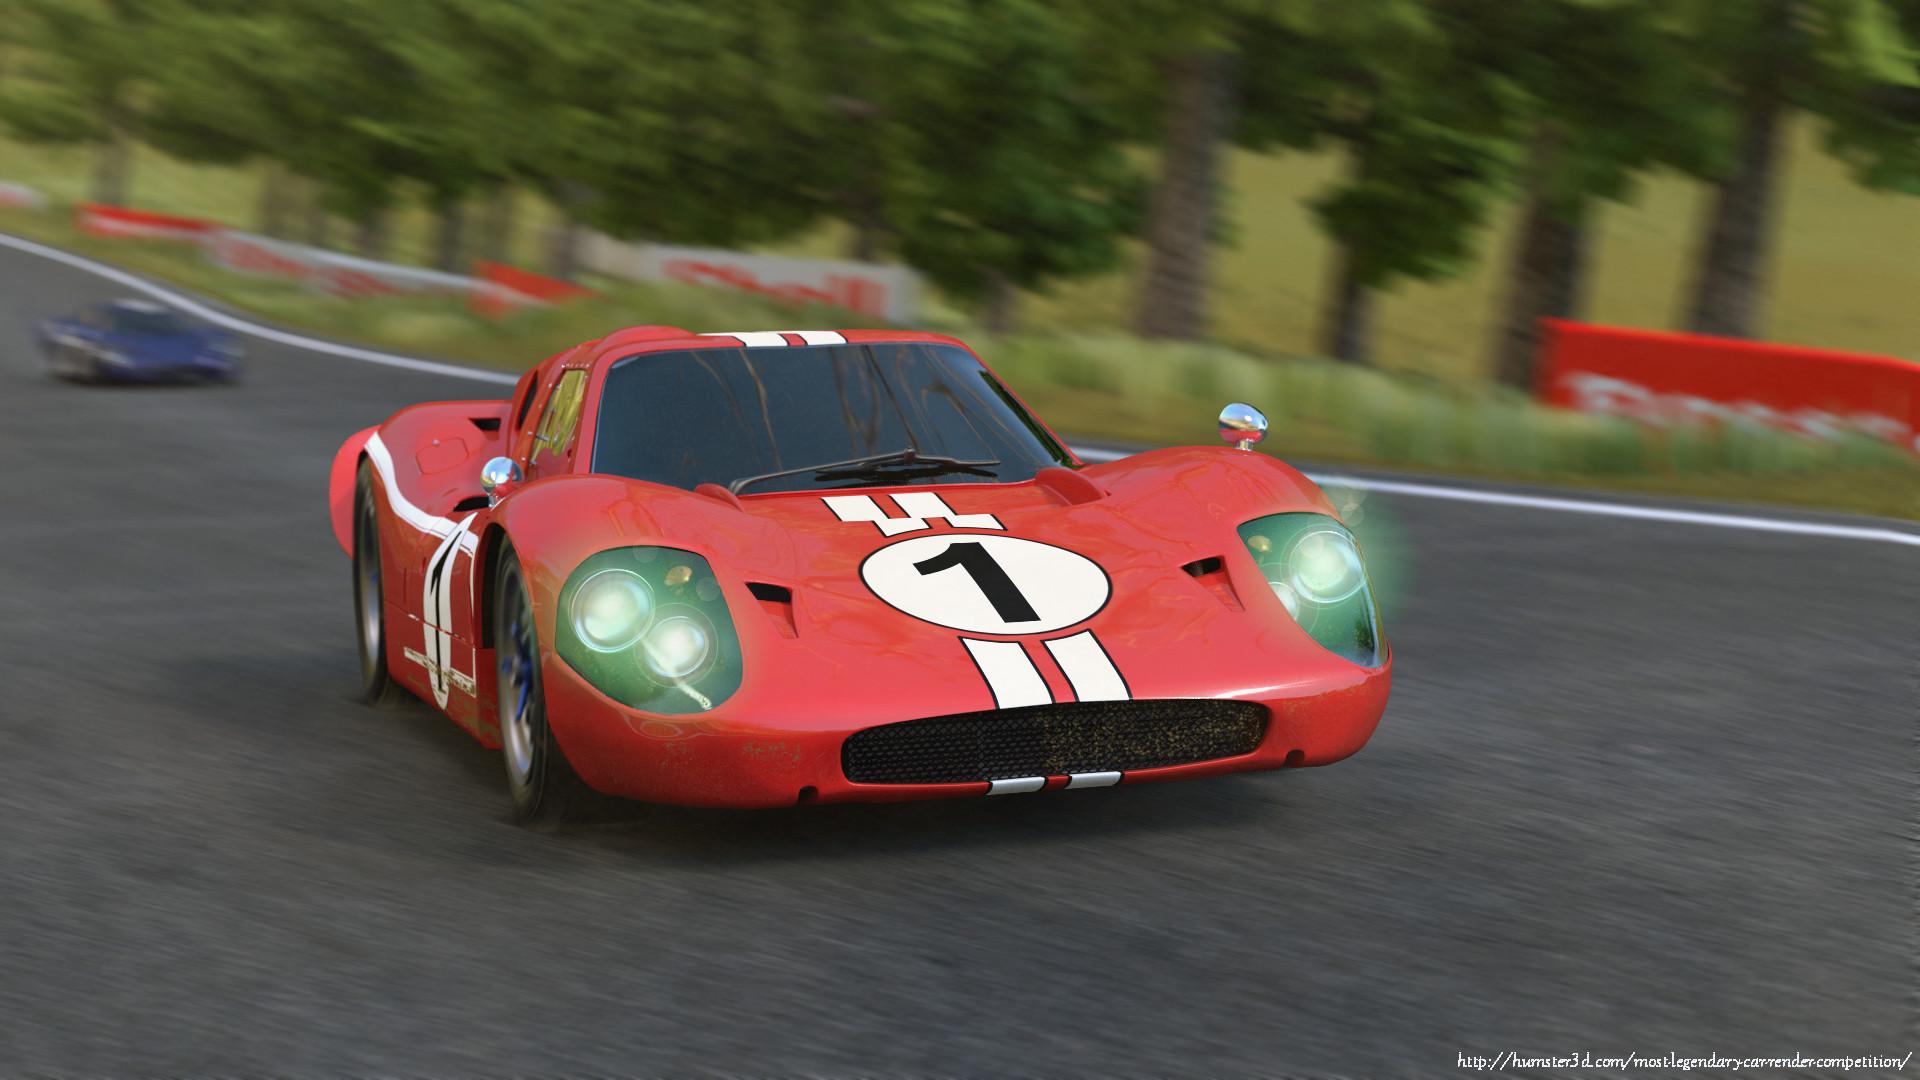 Ford GT40 Mk. IV 1967 3d art